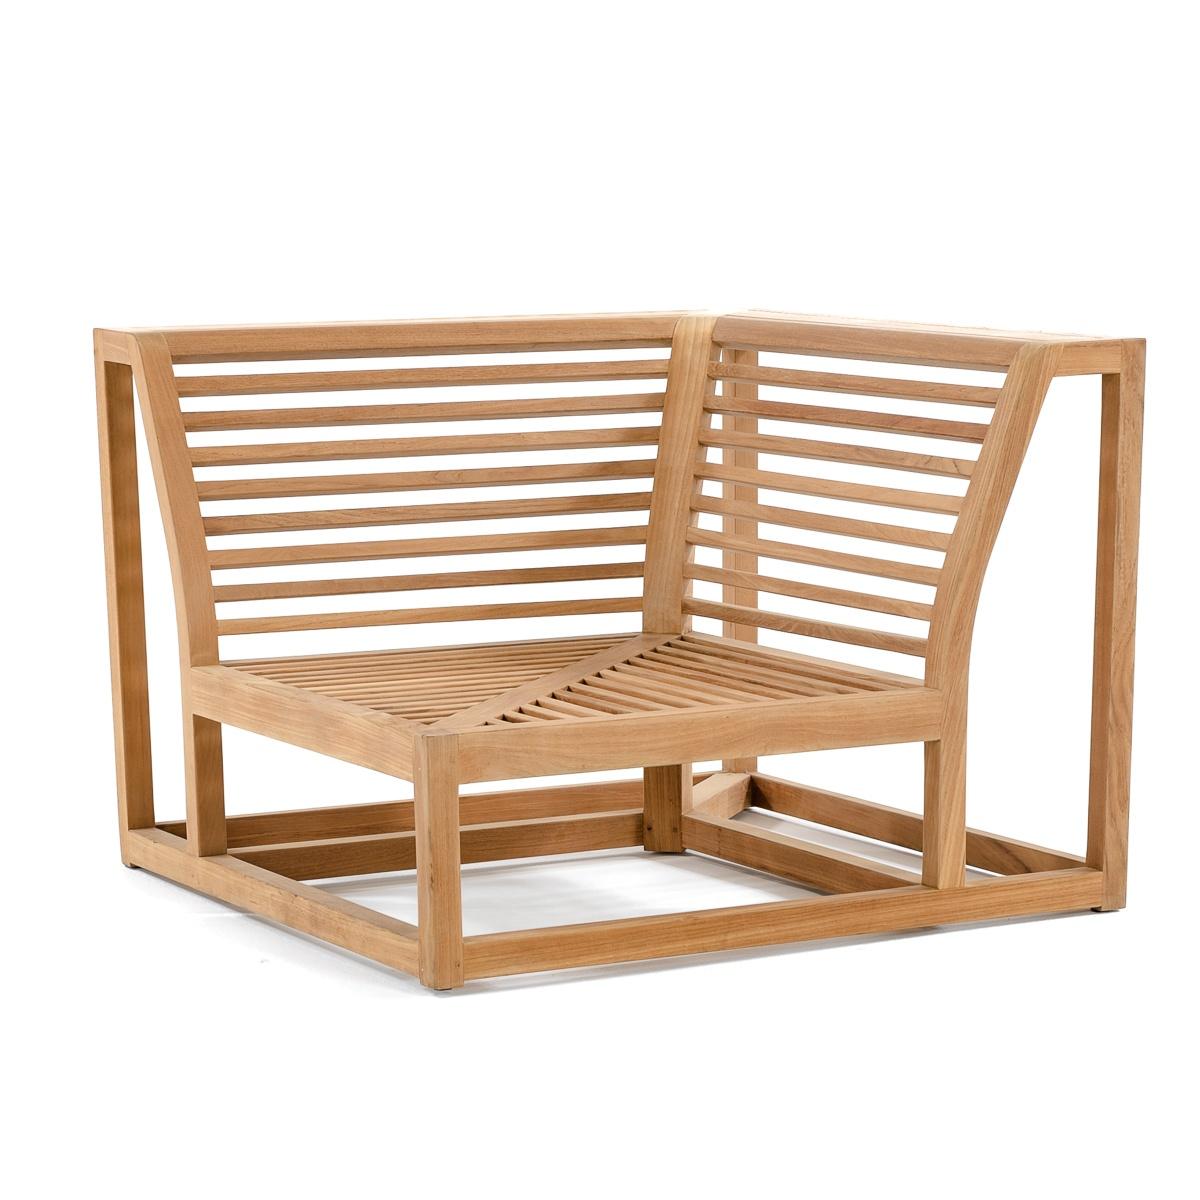 Maya Teak Modular Sofa Conversation Set Westminster Teak Outdoor Furniture